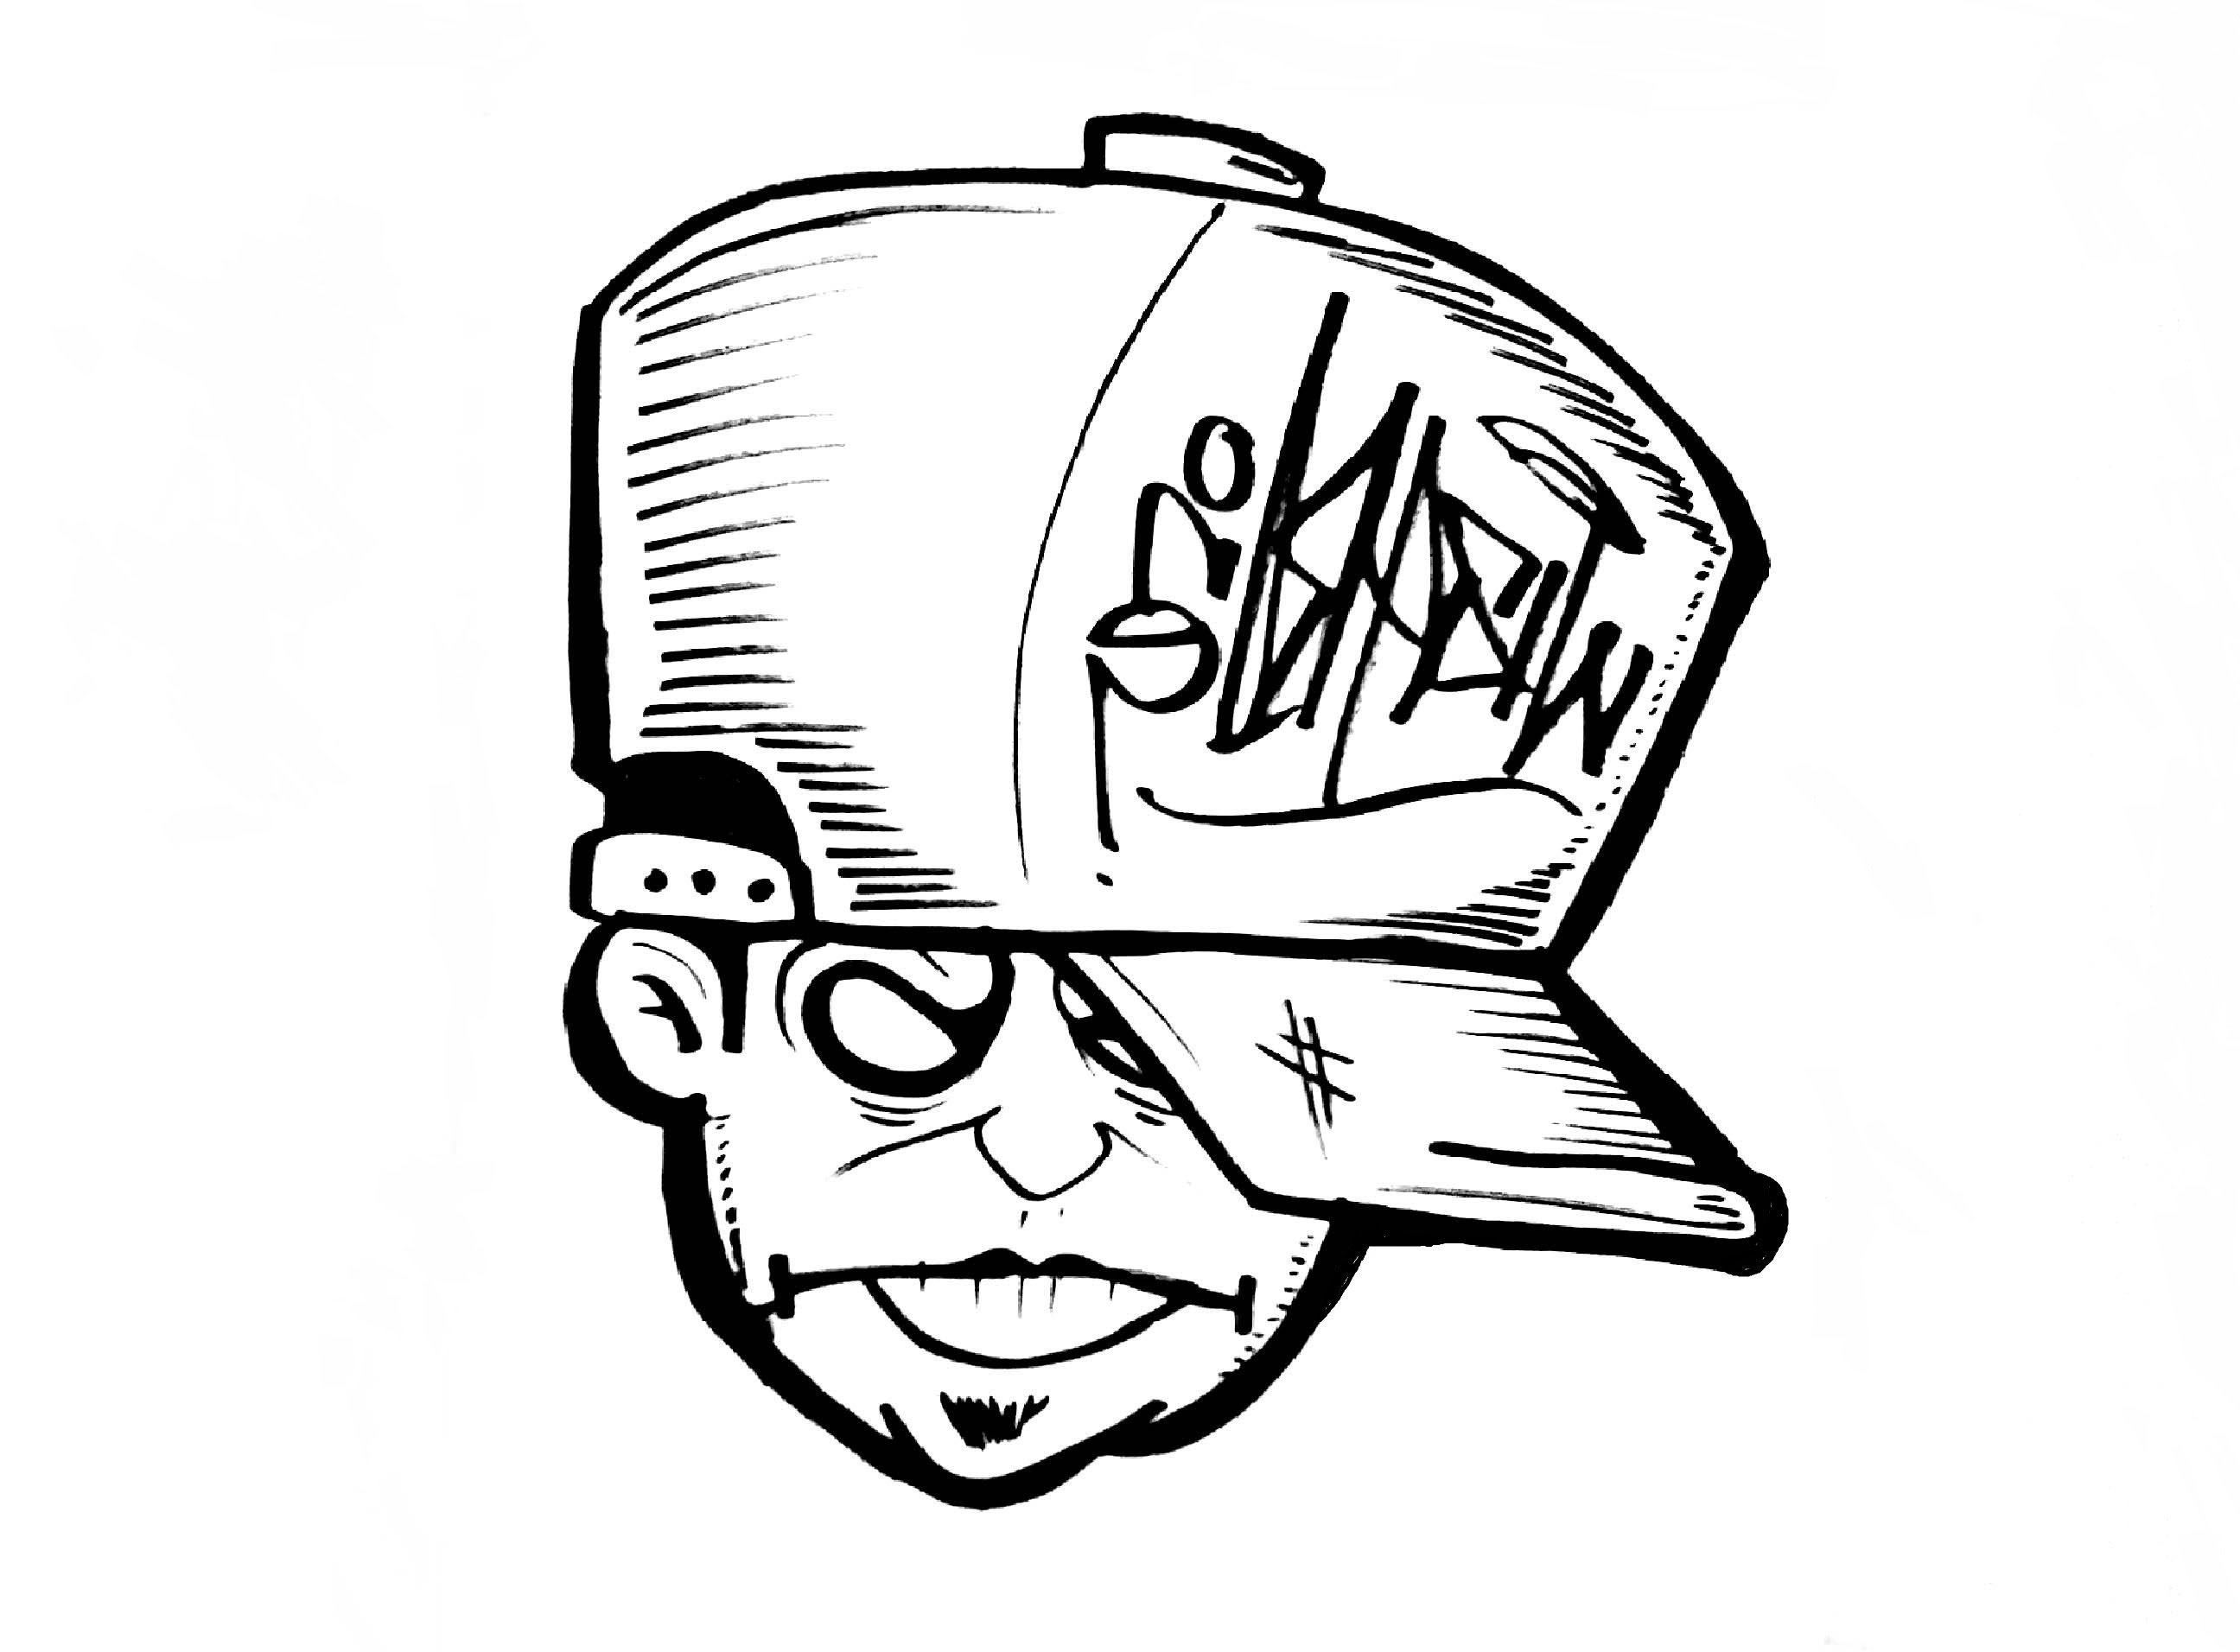 2592x1912 Funny Graffiti Characters Drawings How To Draw Face (Graffiti